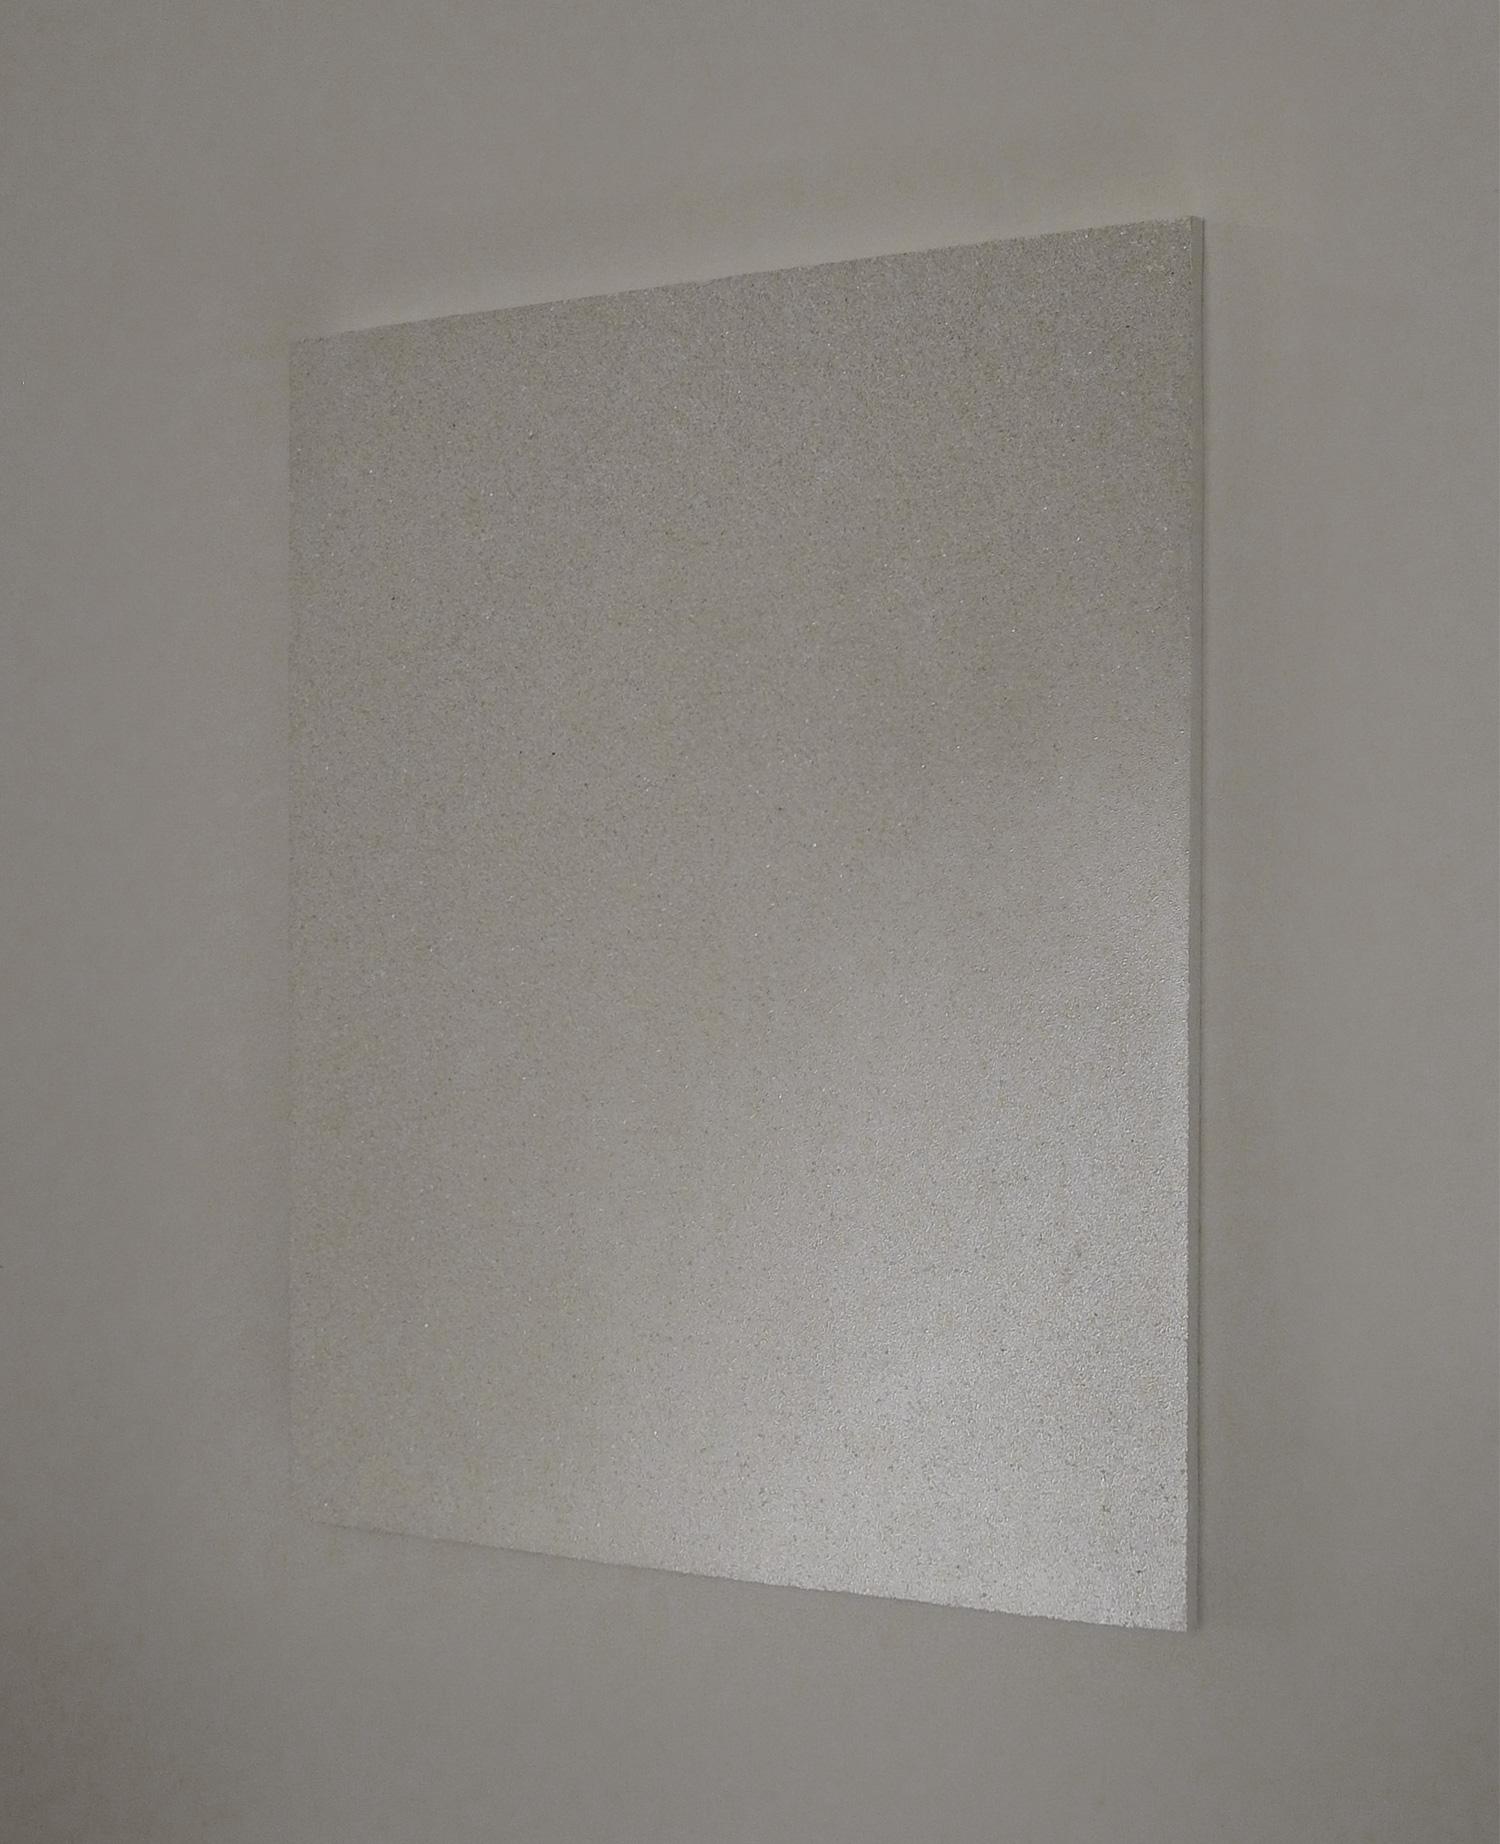 White-glass-painting-2-Buckley-72dpi-1500px-web.jpg